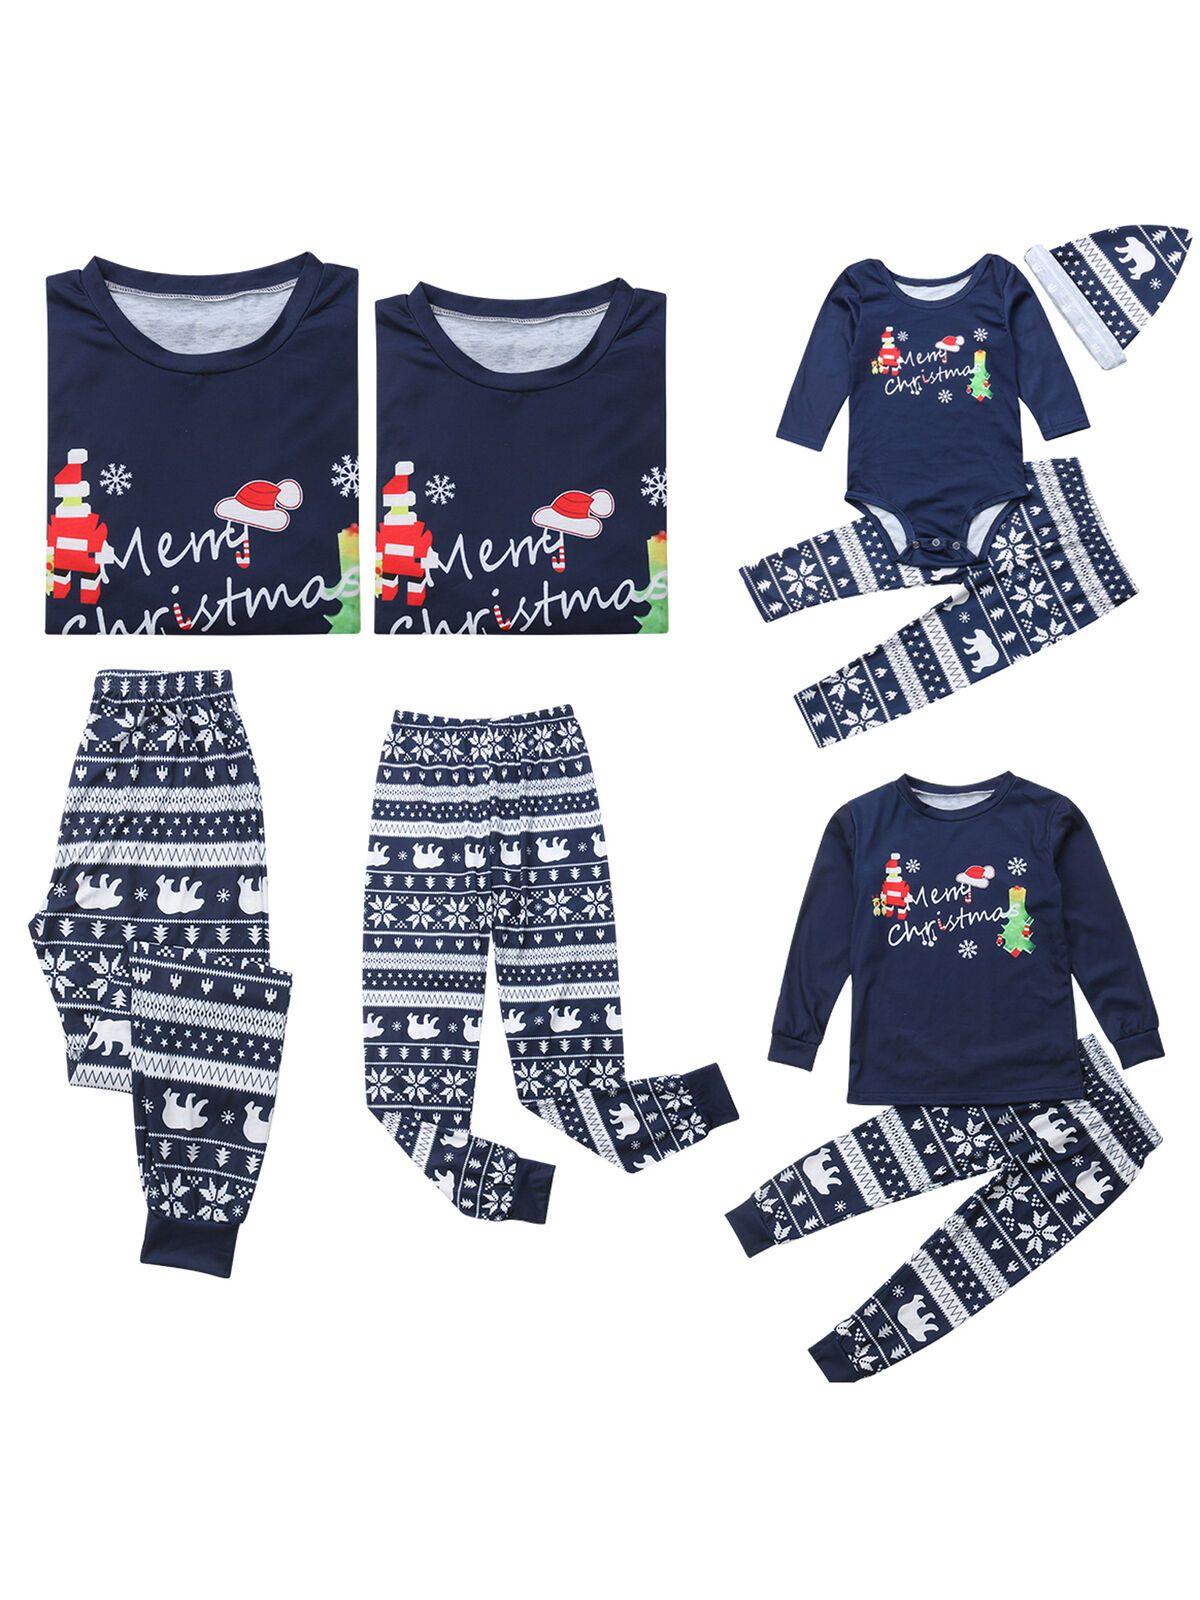 Calsunbaby Christmas Family Matching Pajamas PJs Set Dad